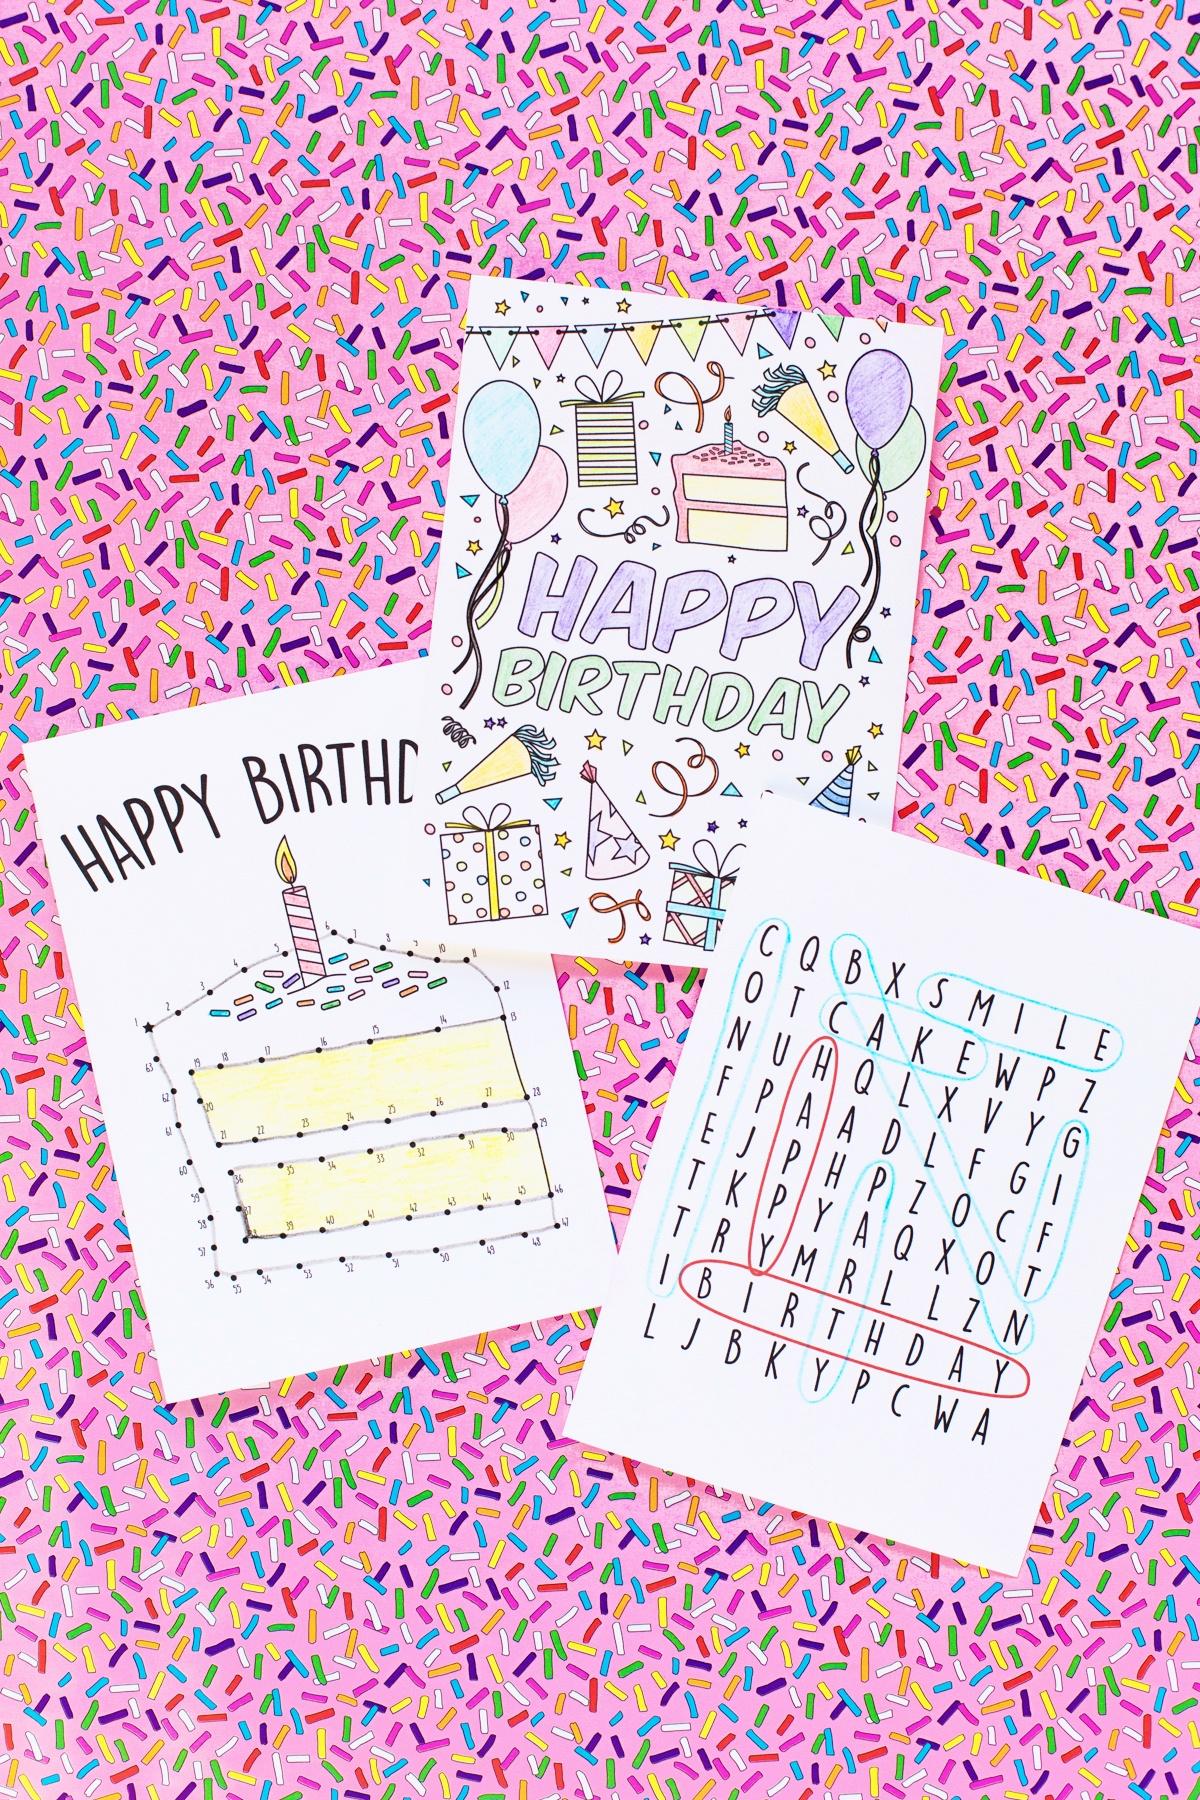 Free Printable Birthday Cards For Kids - Studio Diy - Free Printable Birthday Cards For Kids